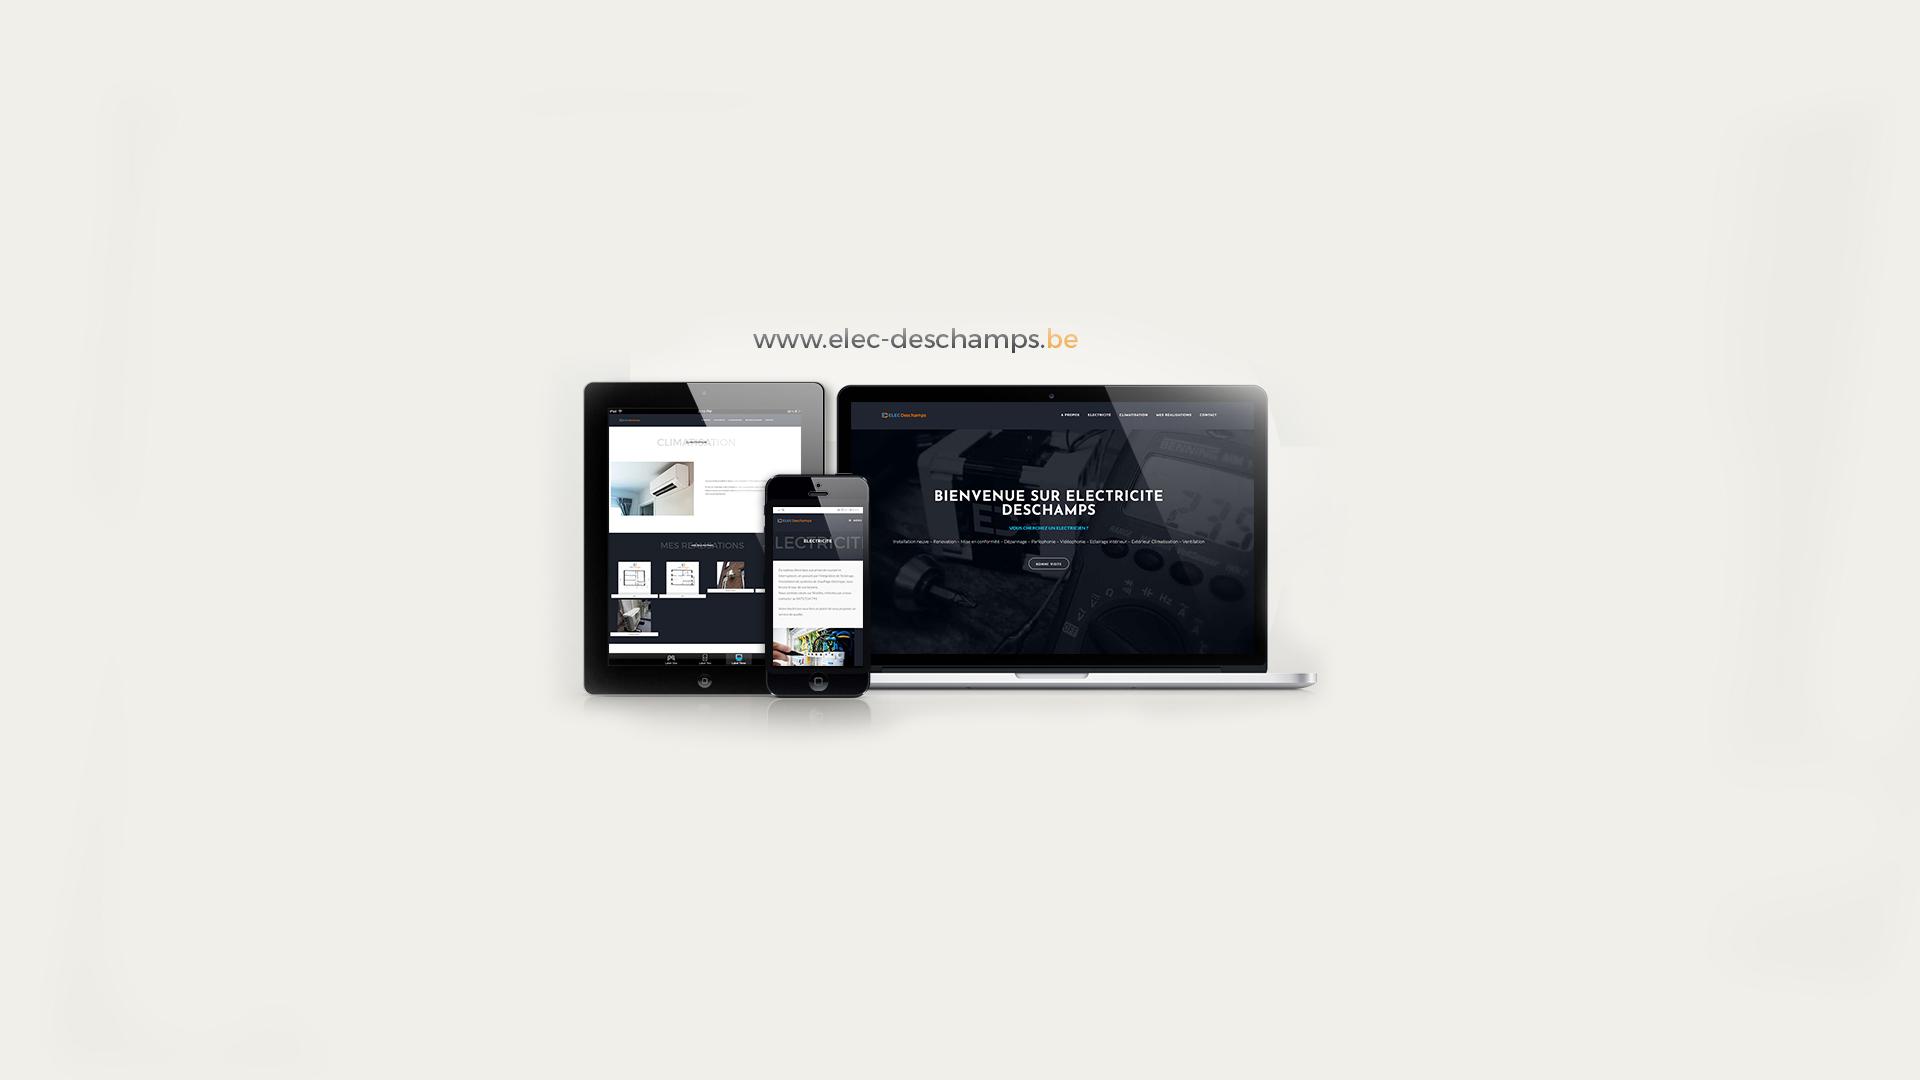 site deschamps